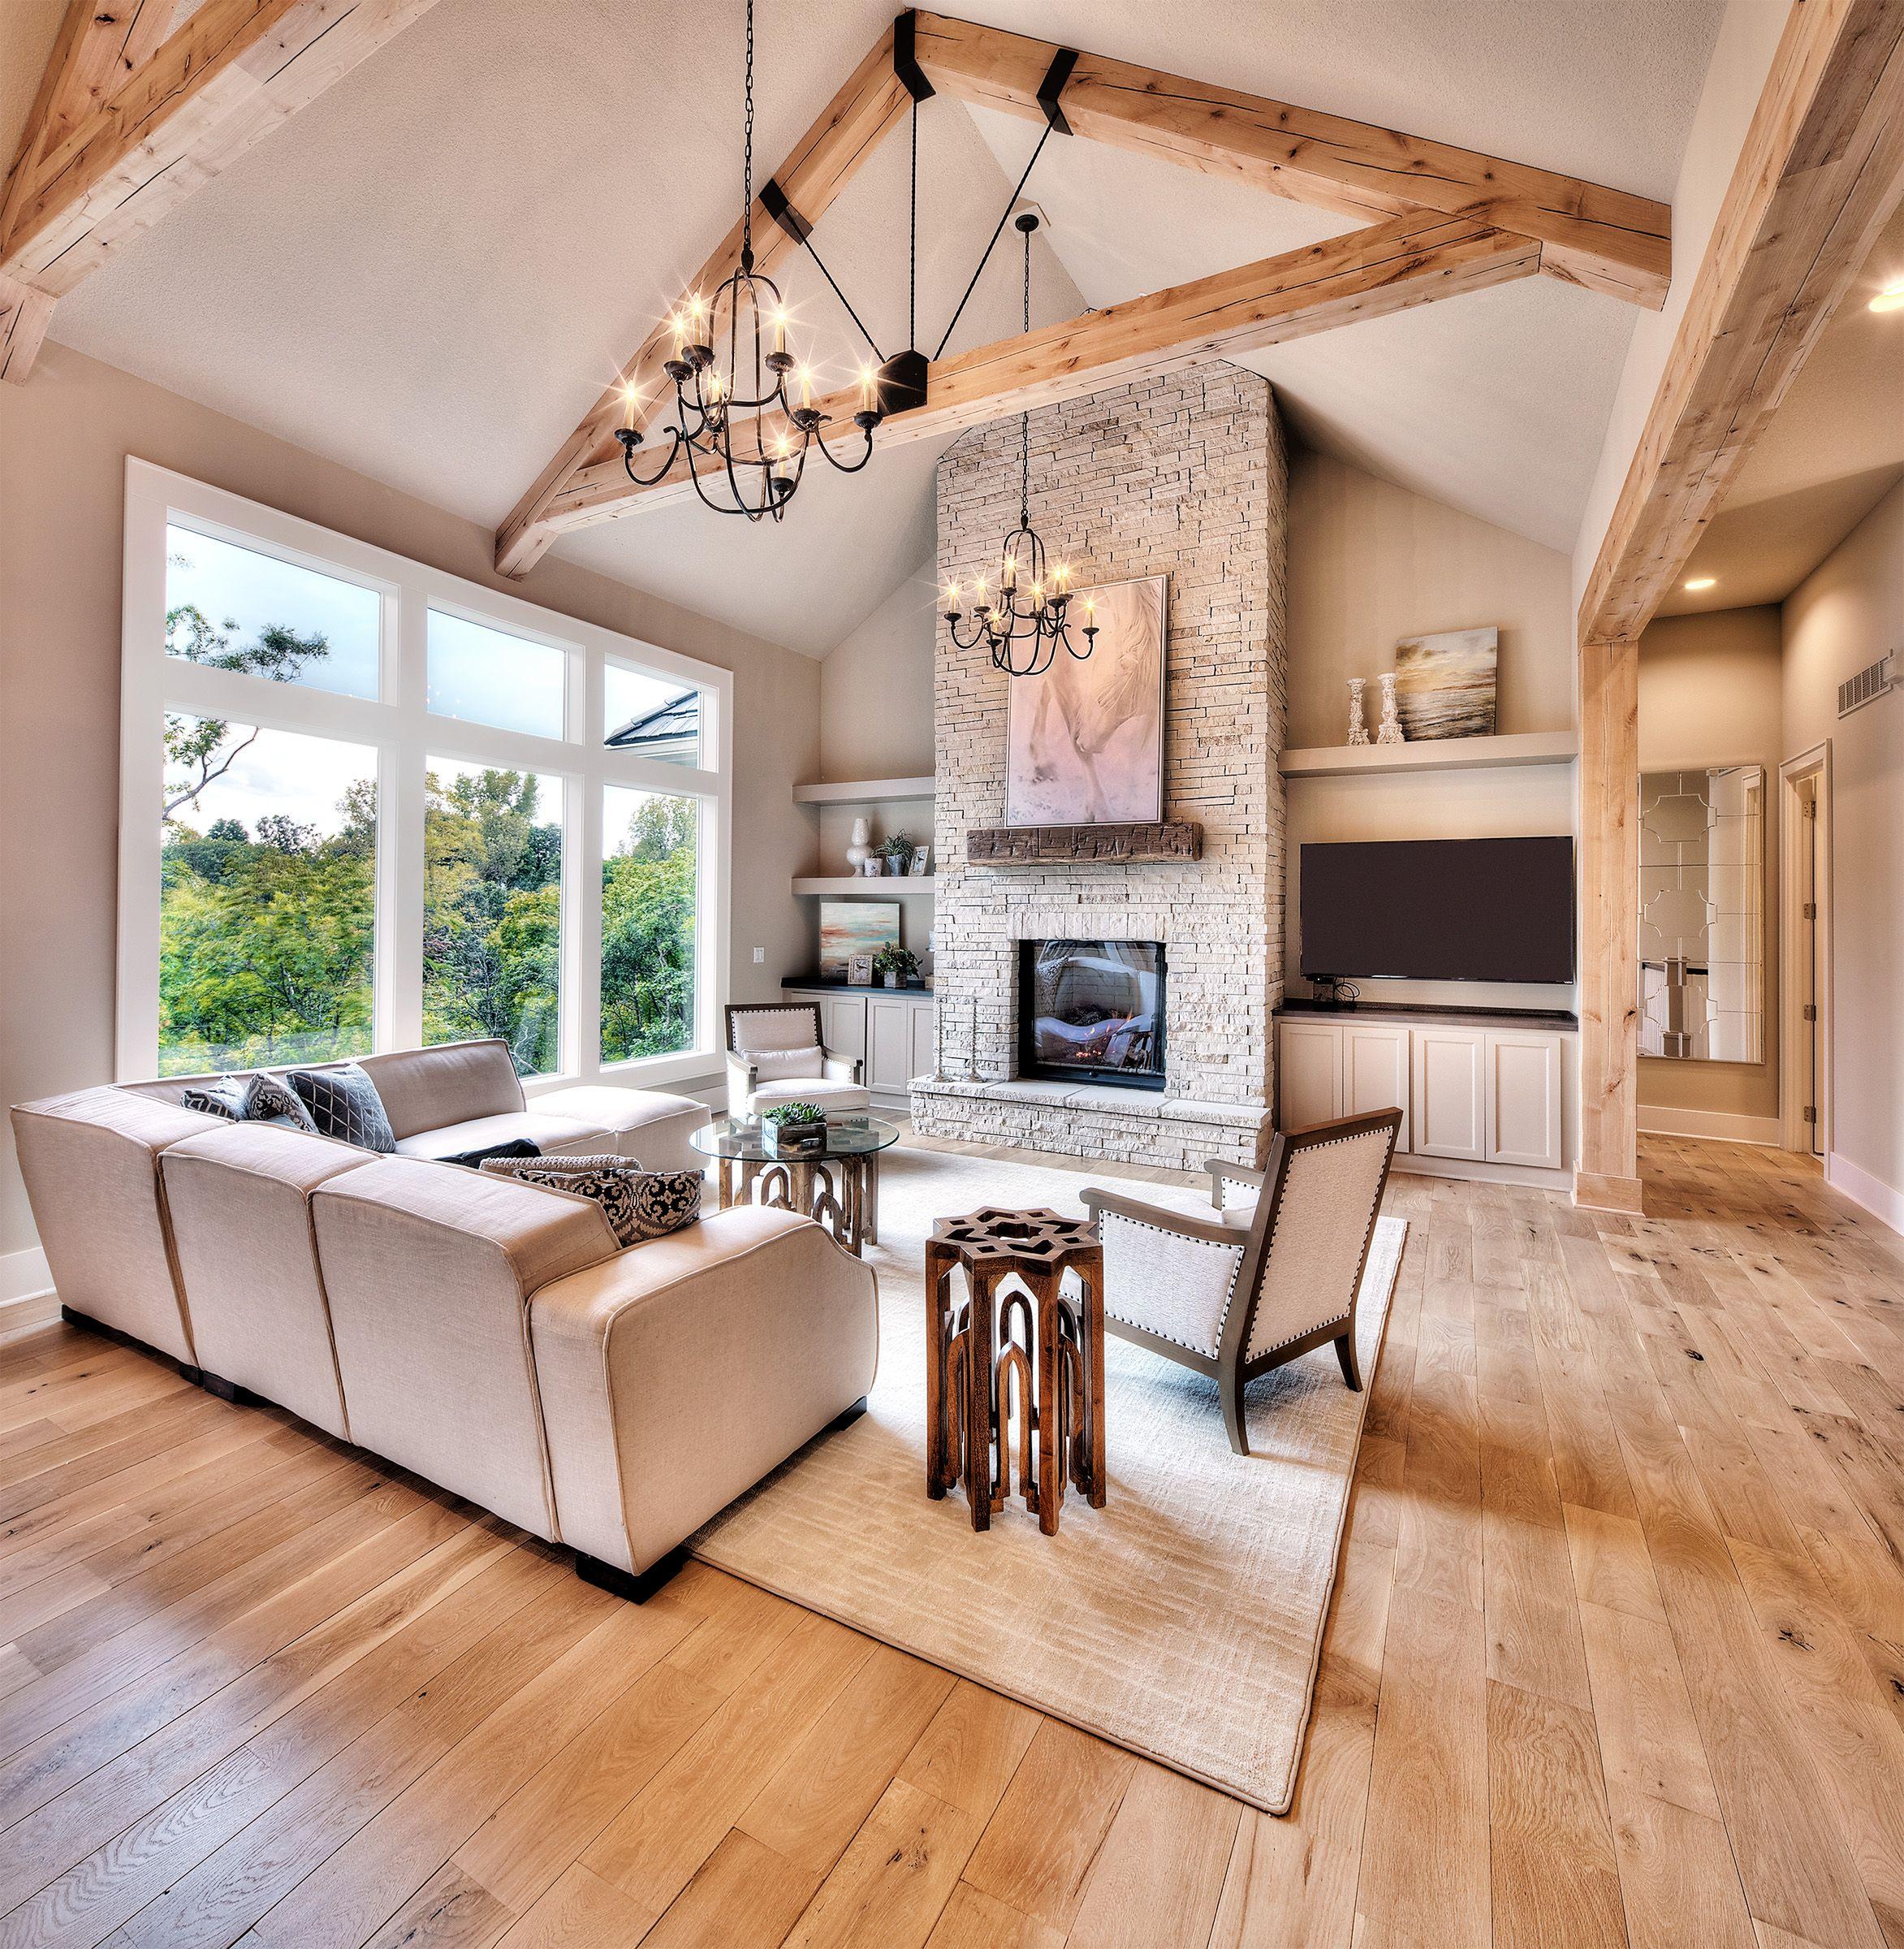 Hearthroom: Hardwood Floors, Large Windows, Open Concept